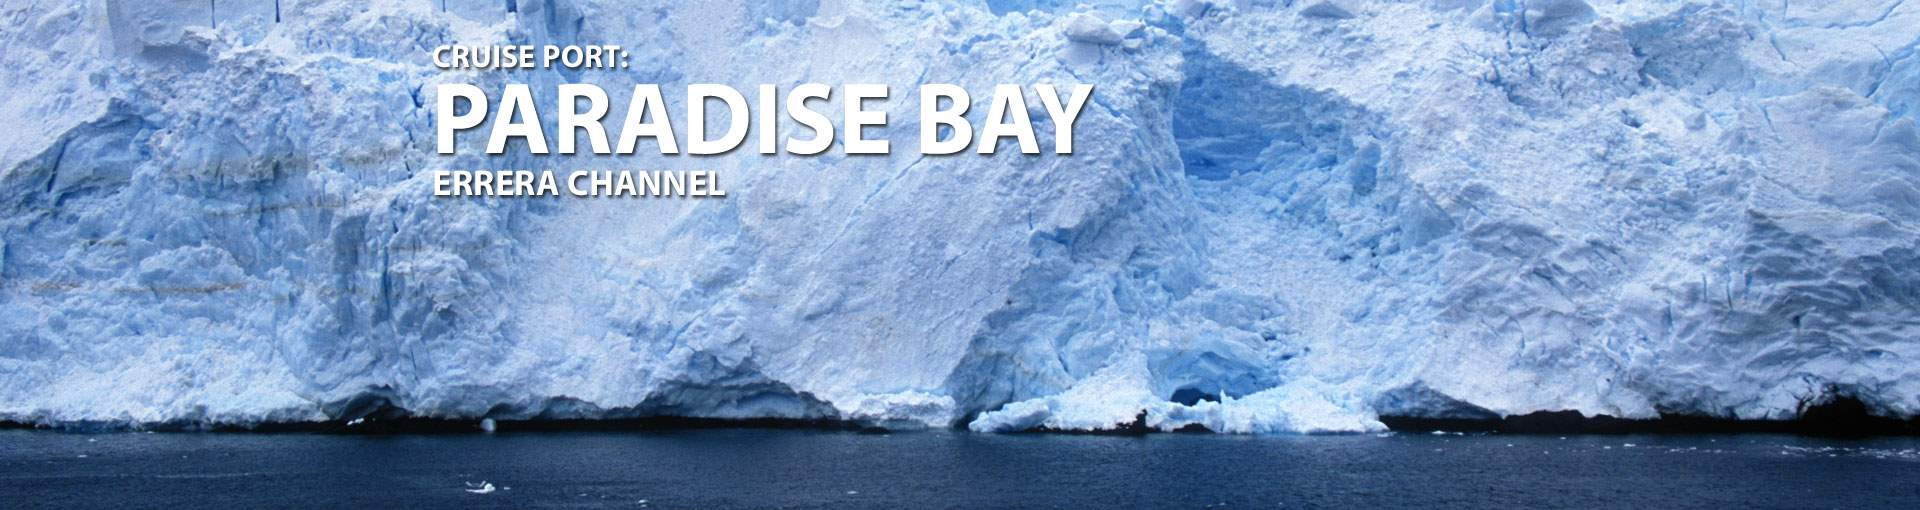 Cruises to Paradise Bay, Errera Channel